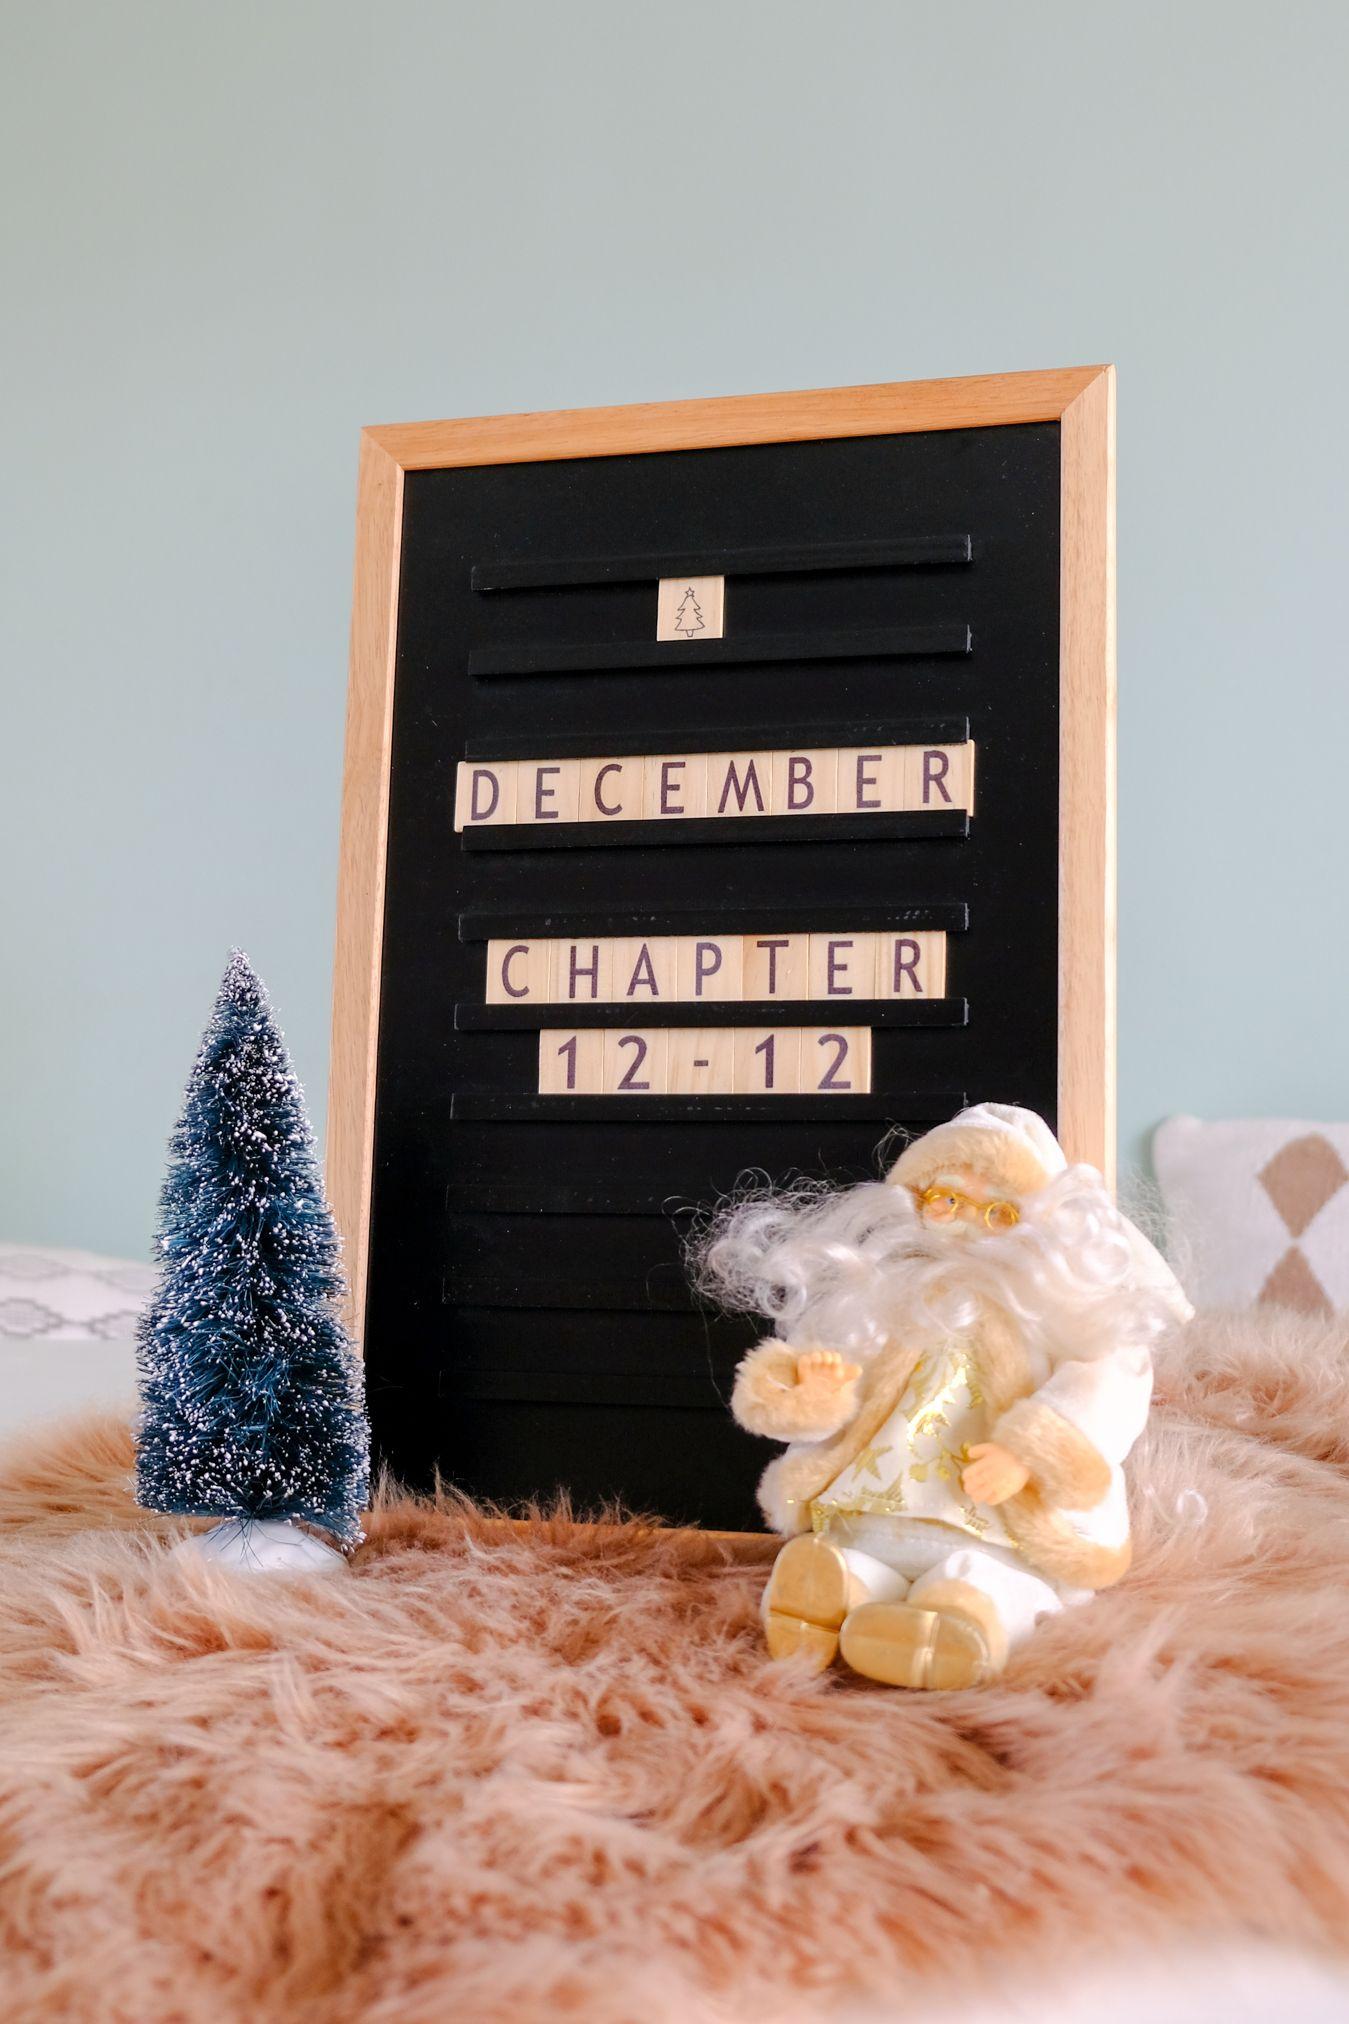 Citaten Over De Winter : December teksten quotes over de winter interior u quotes